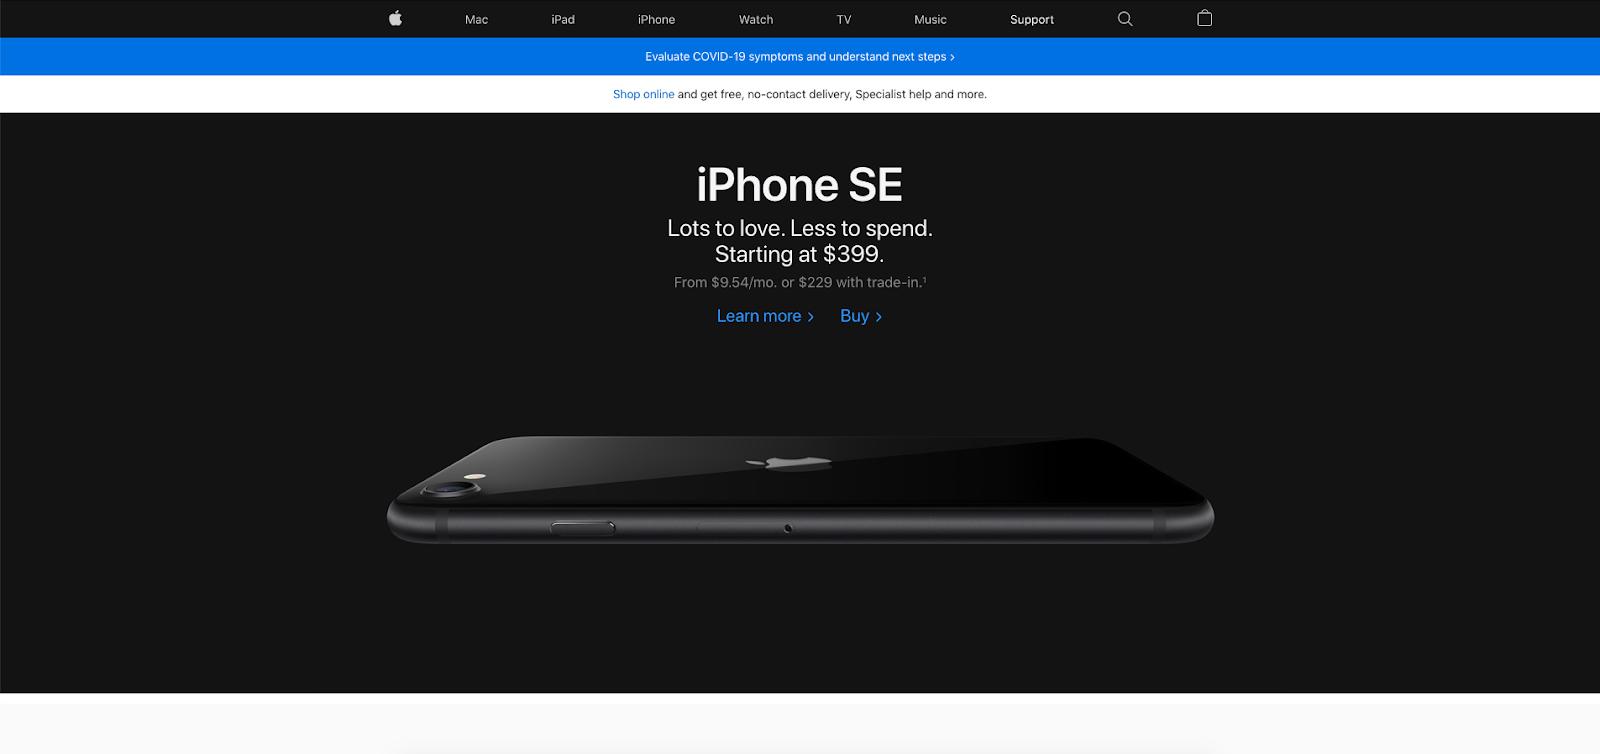 Crisis design on the Apple website